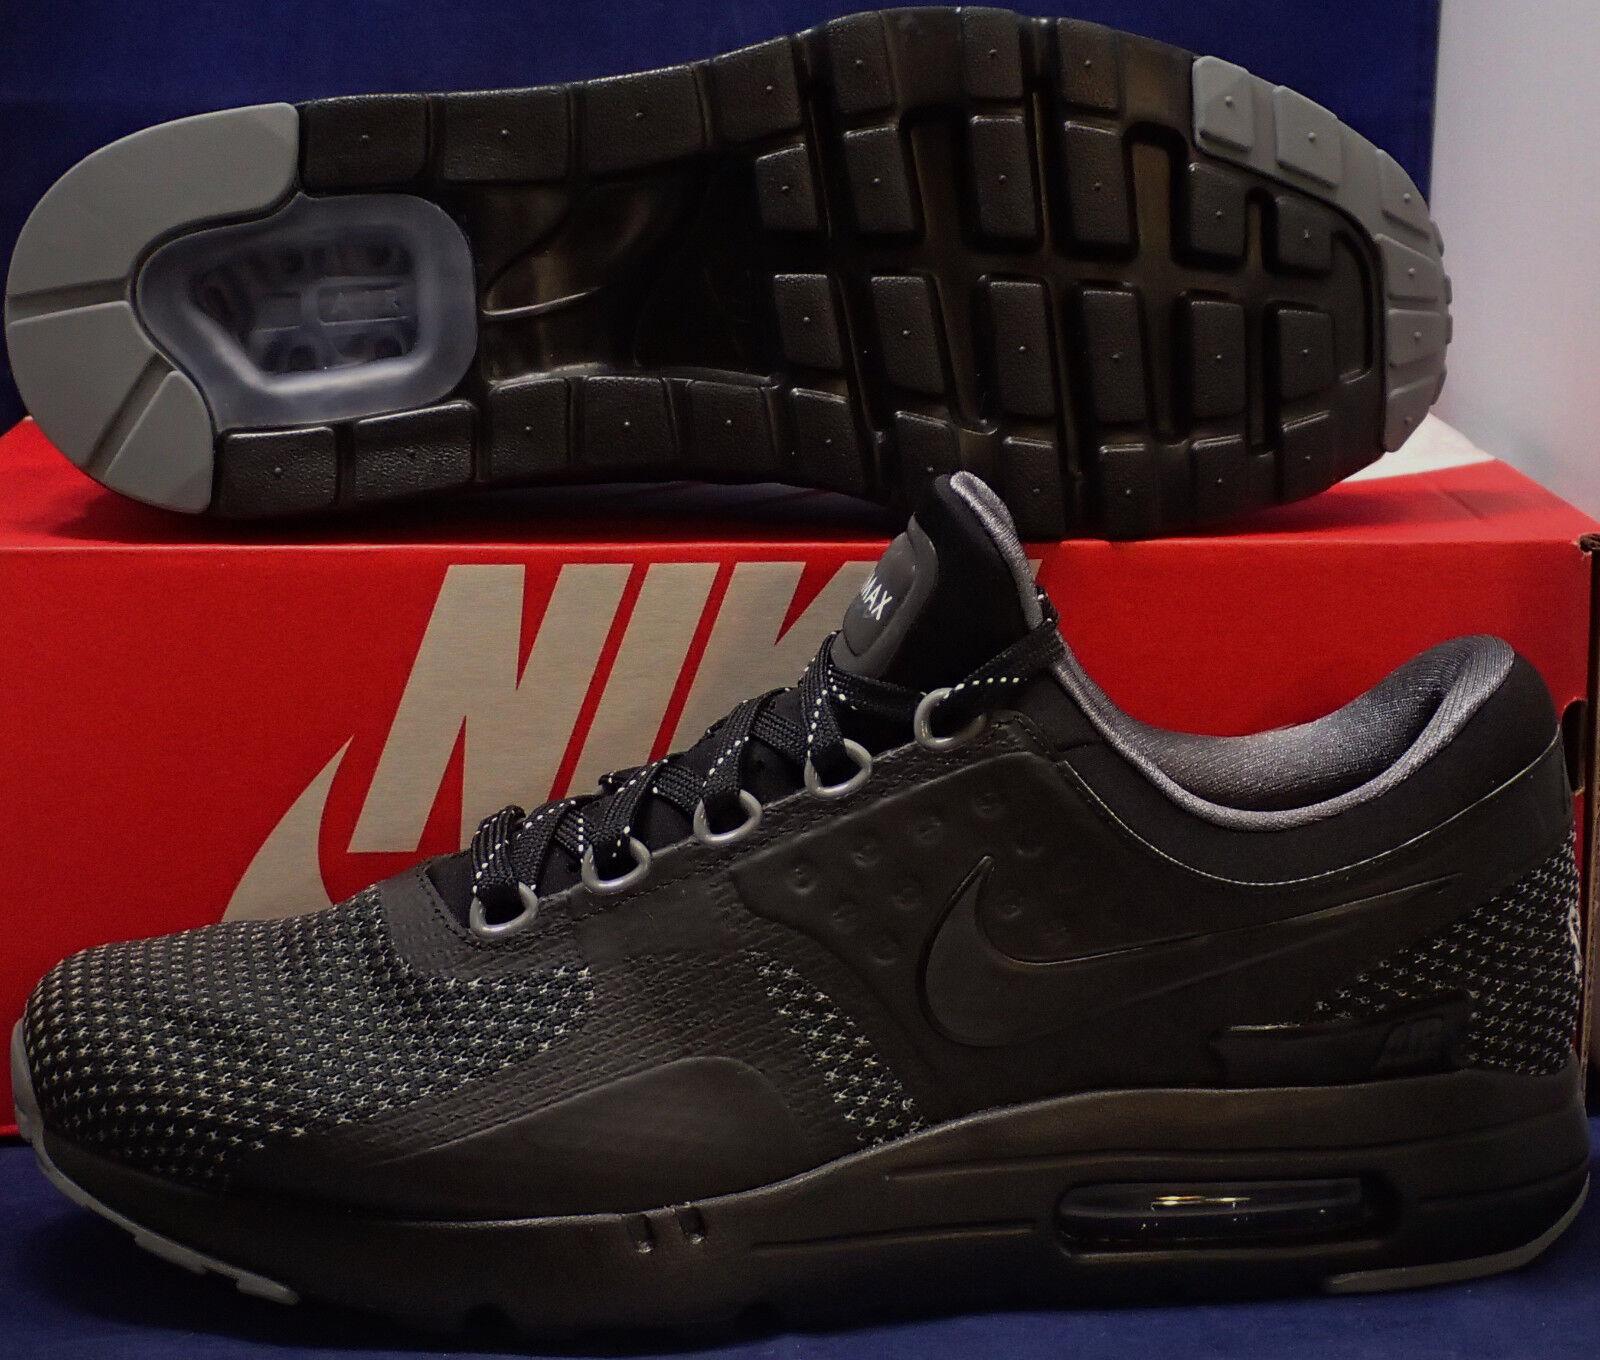 Nike Air Max Zero Id Id Zero Noir Gris Sz 10.5 (853860-901) cc5999